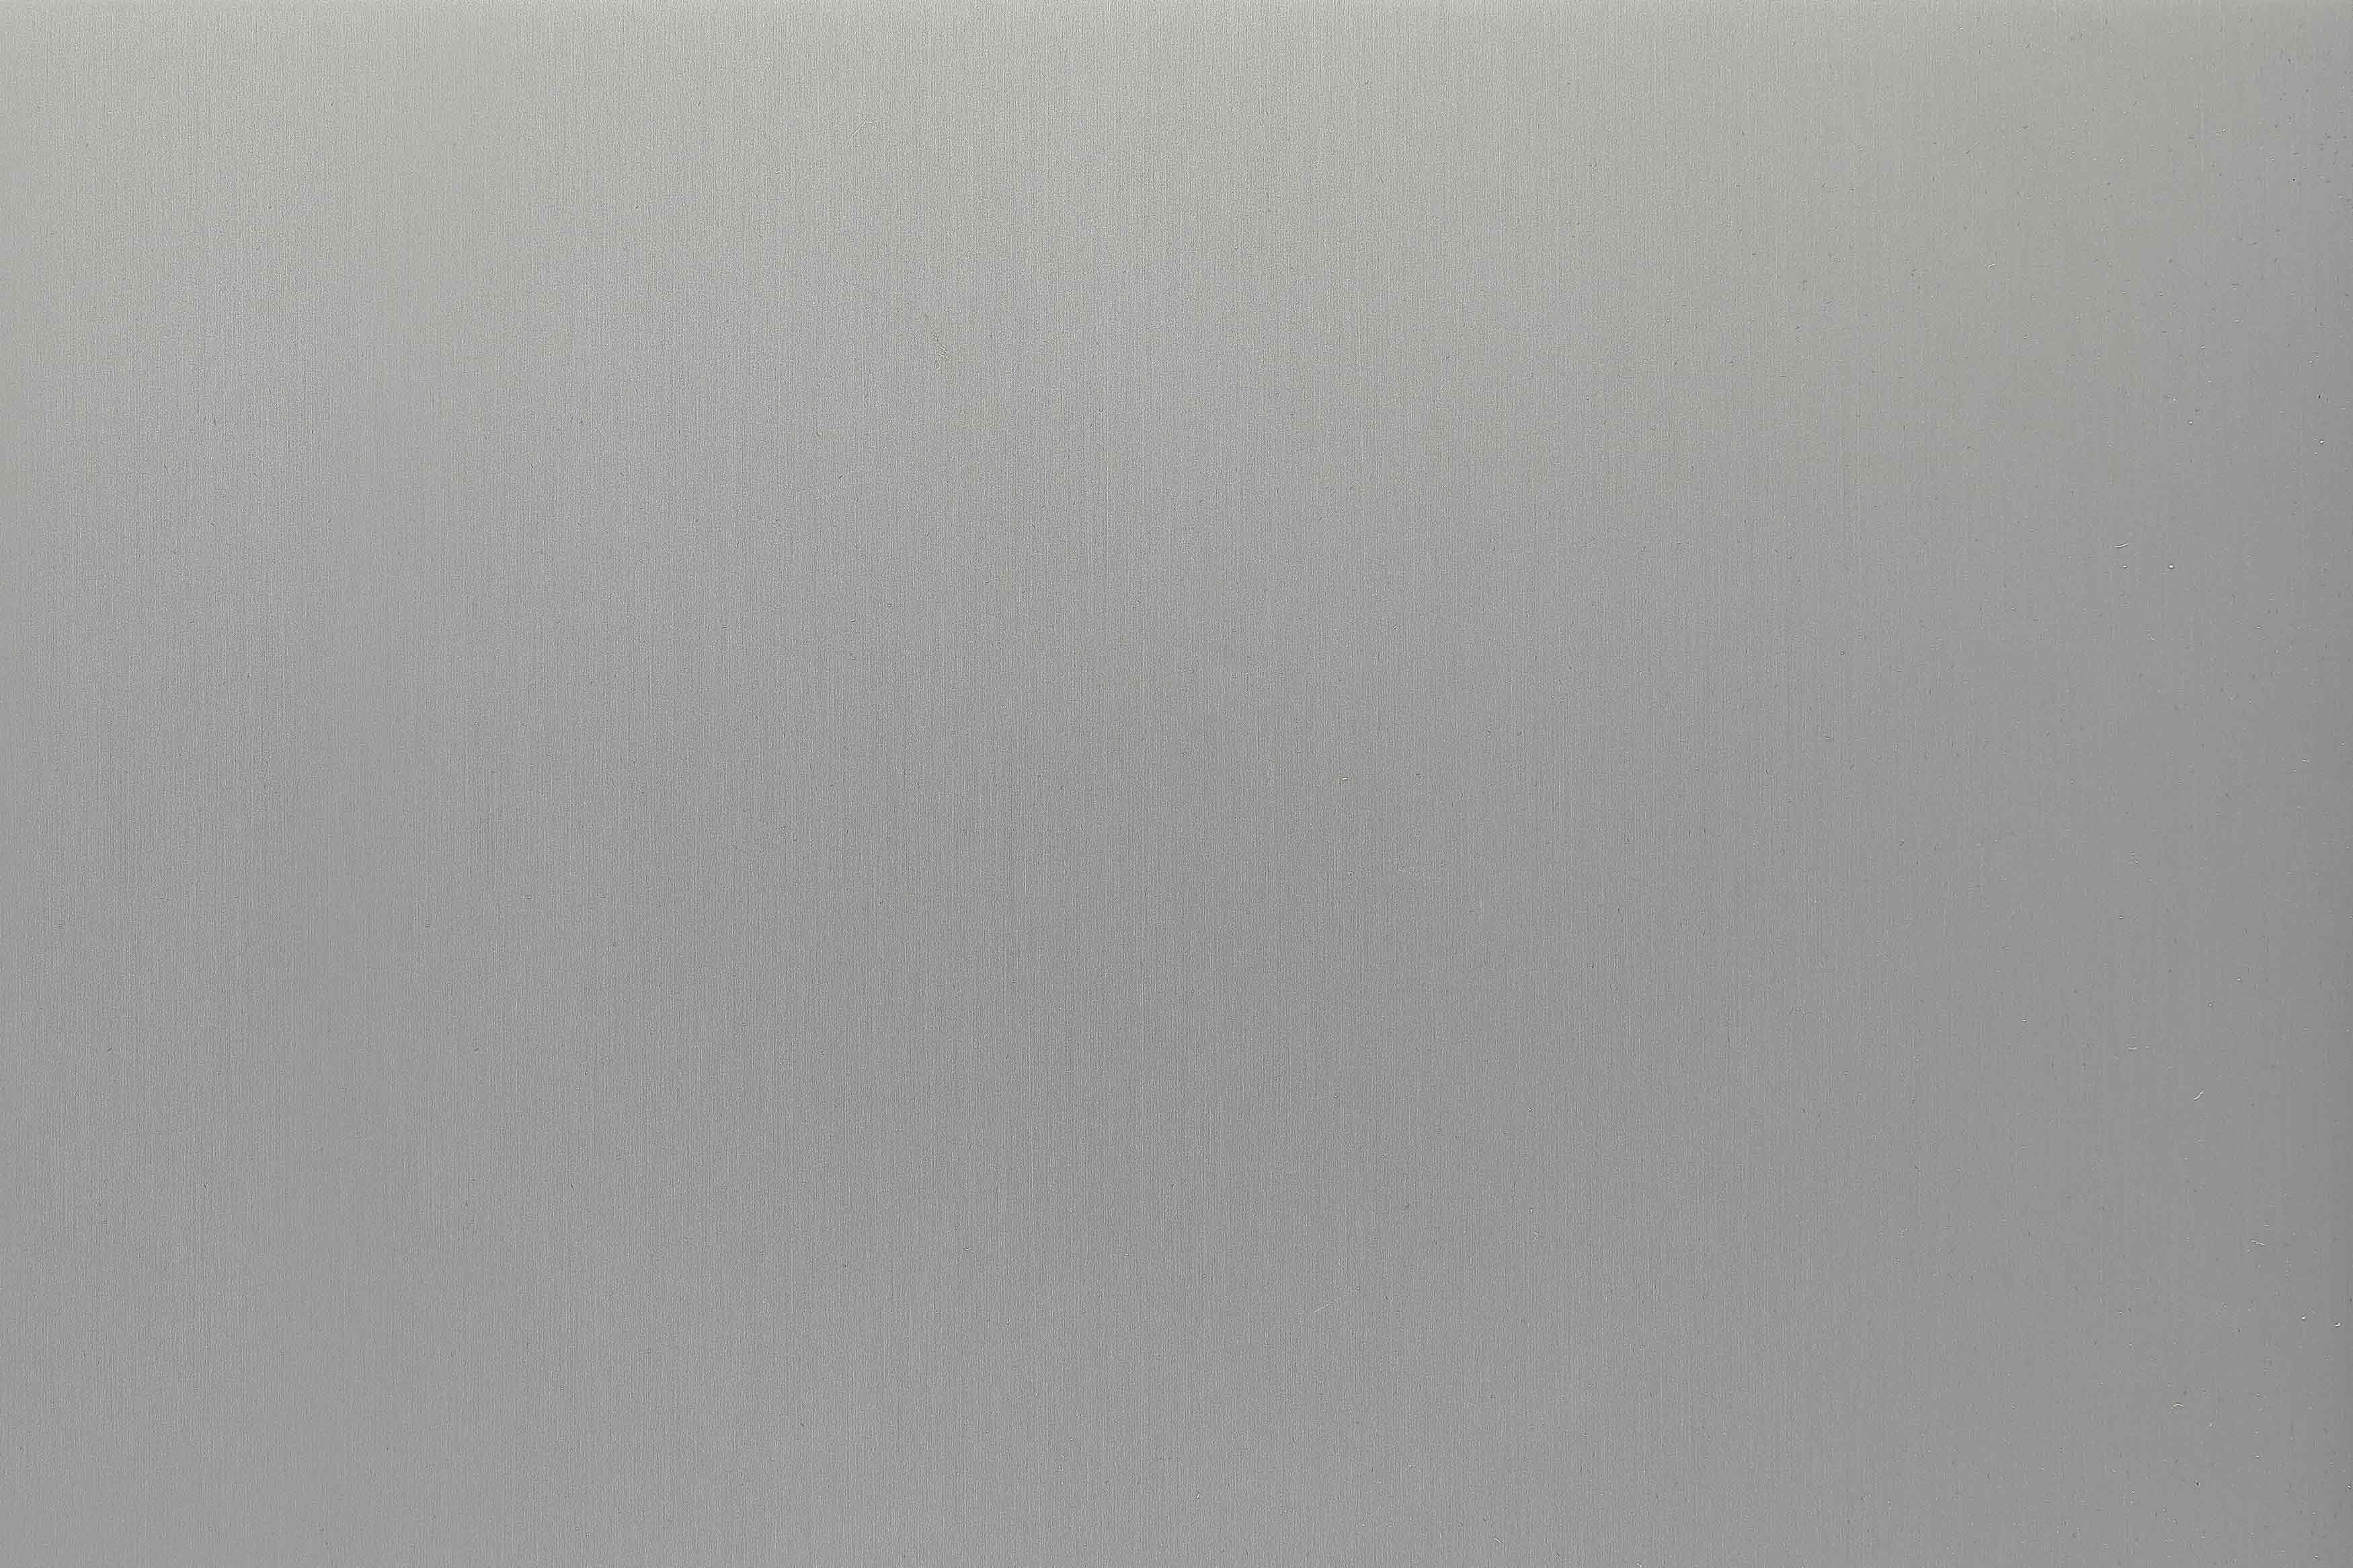 Carta Da Parati Verniciabile pin di rimadesio su finishings and materials | carta da